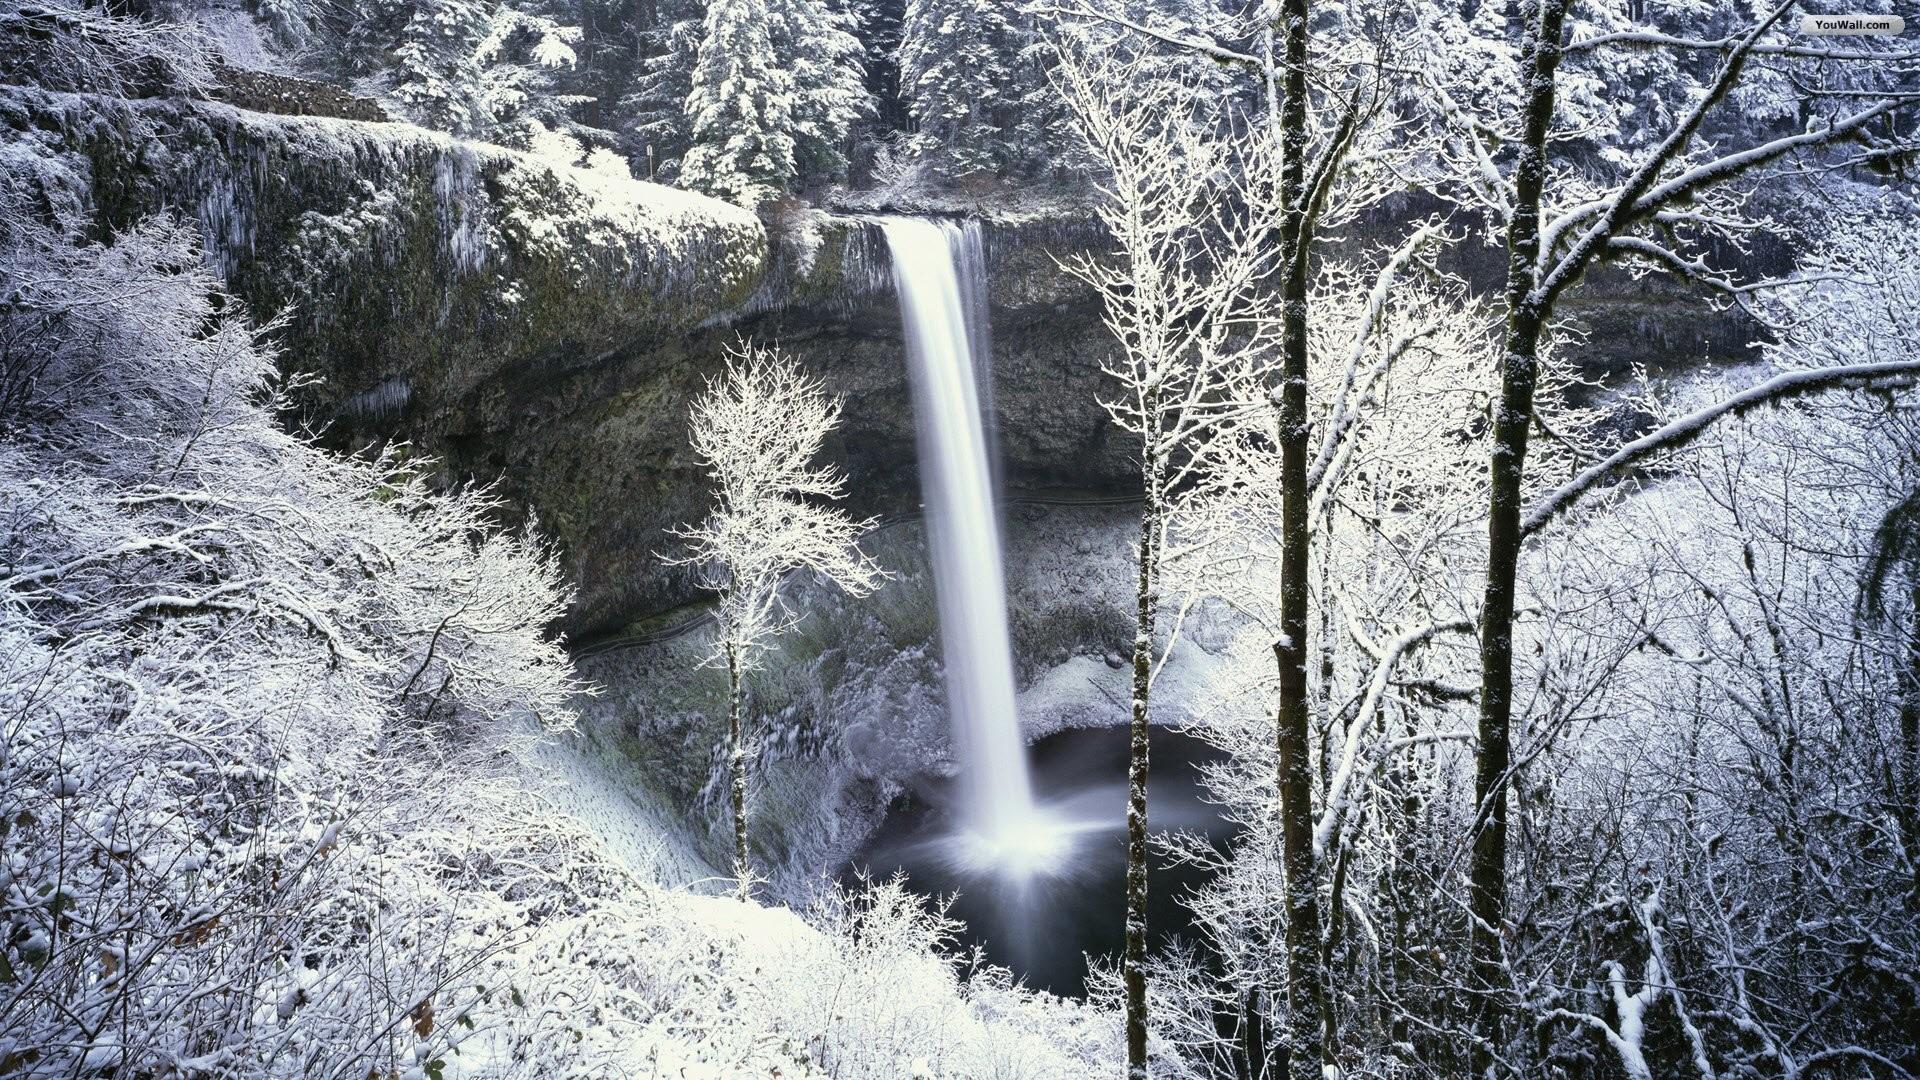 Snowy Forest Waterfall Wallpaper